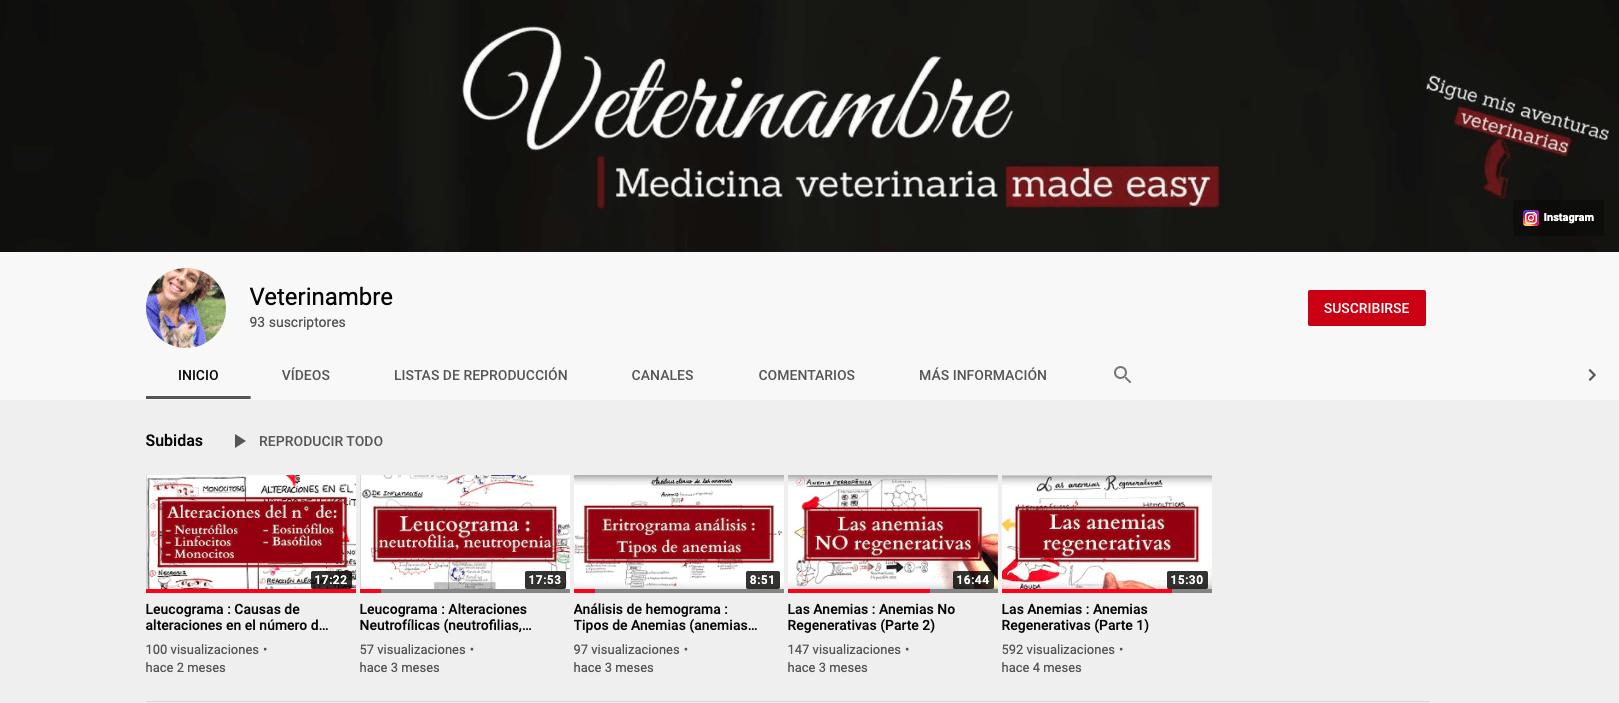 Canal yotube: Veterinambre